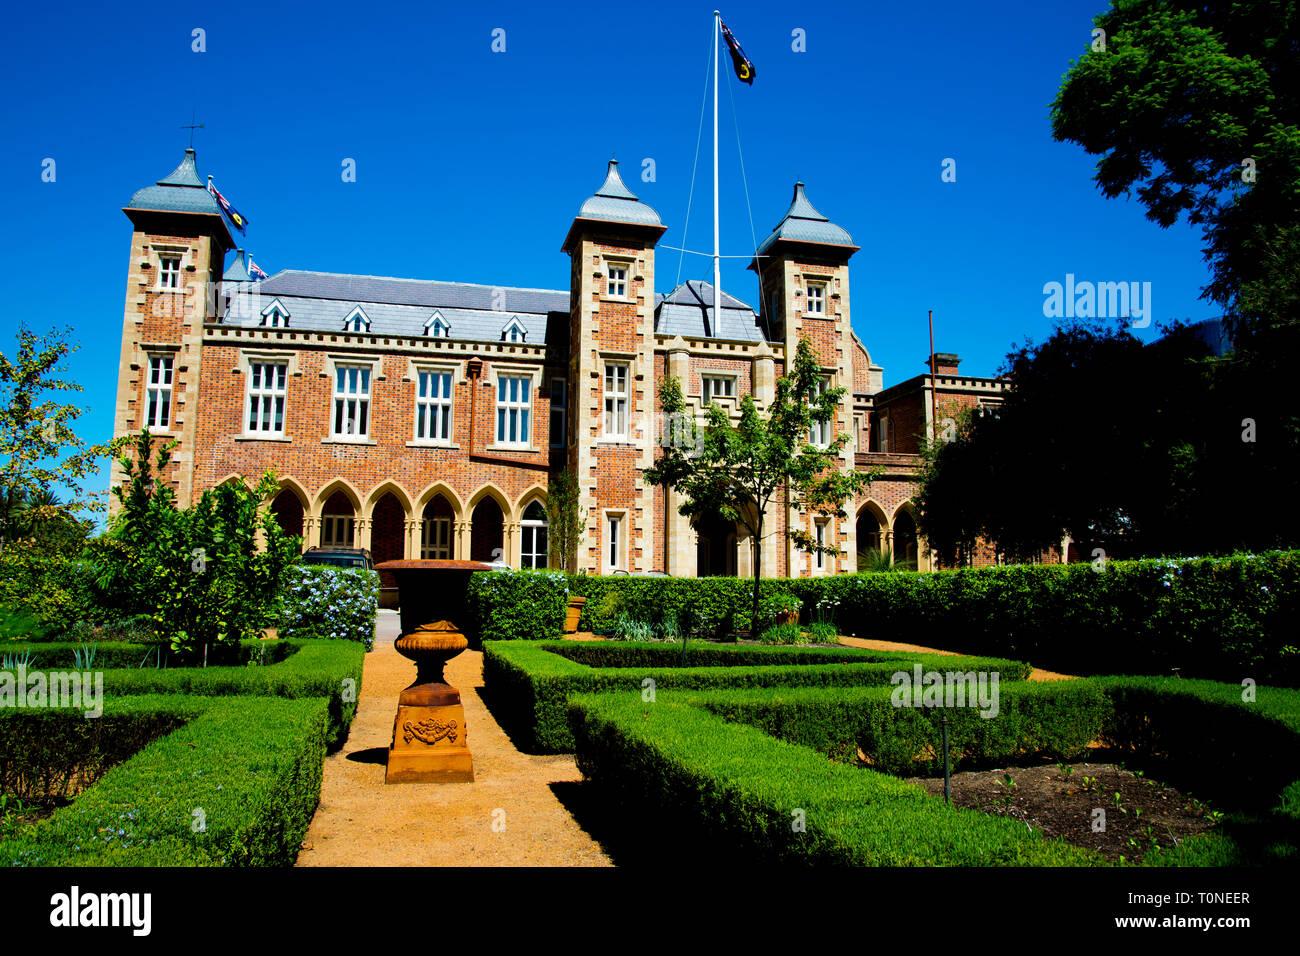 Government House - Perth - Australia Stock Photo